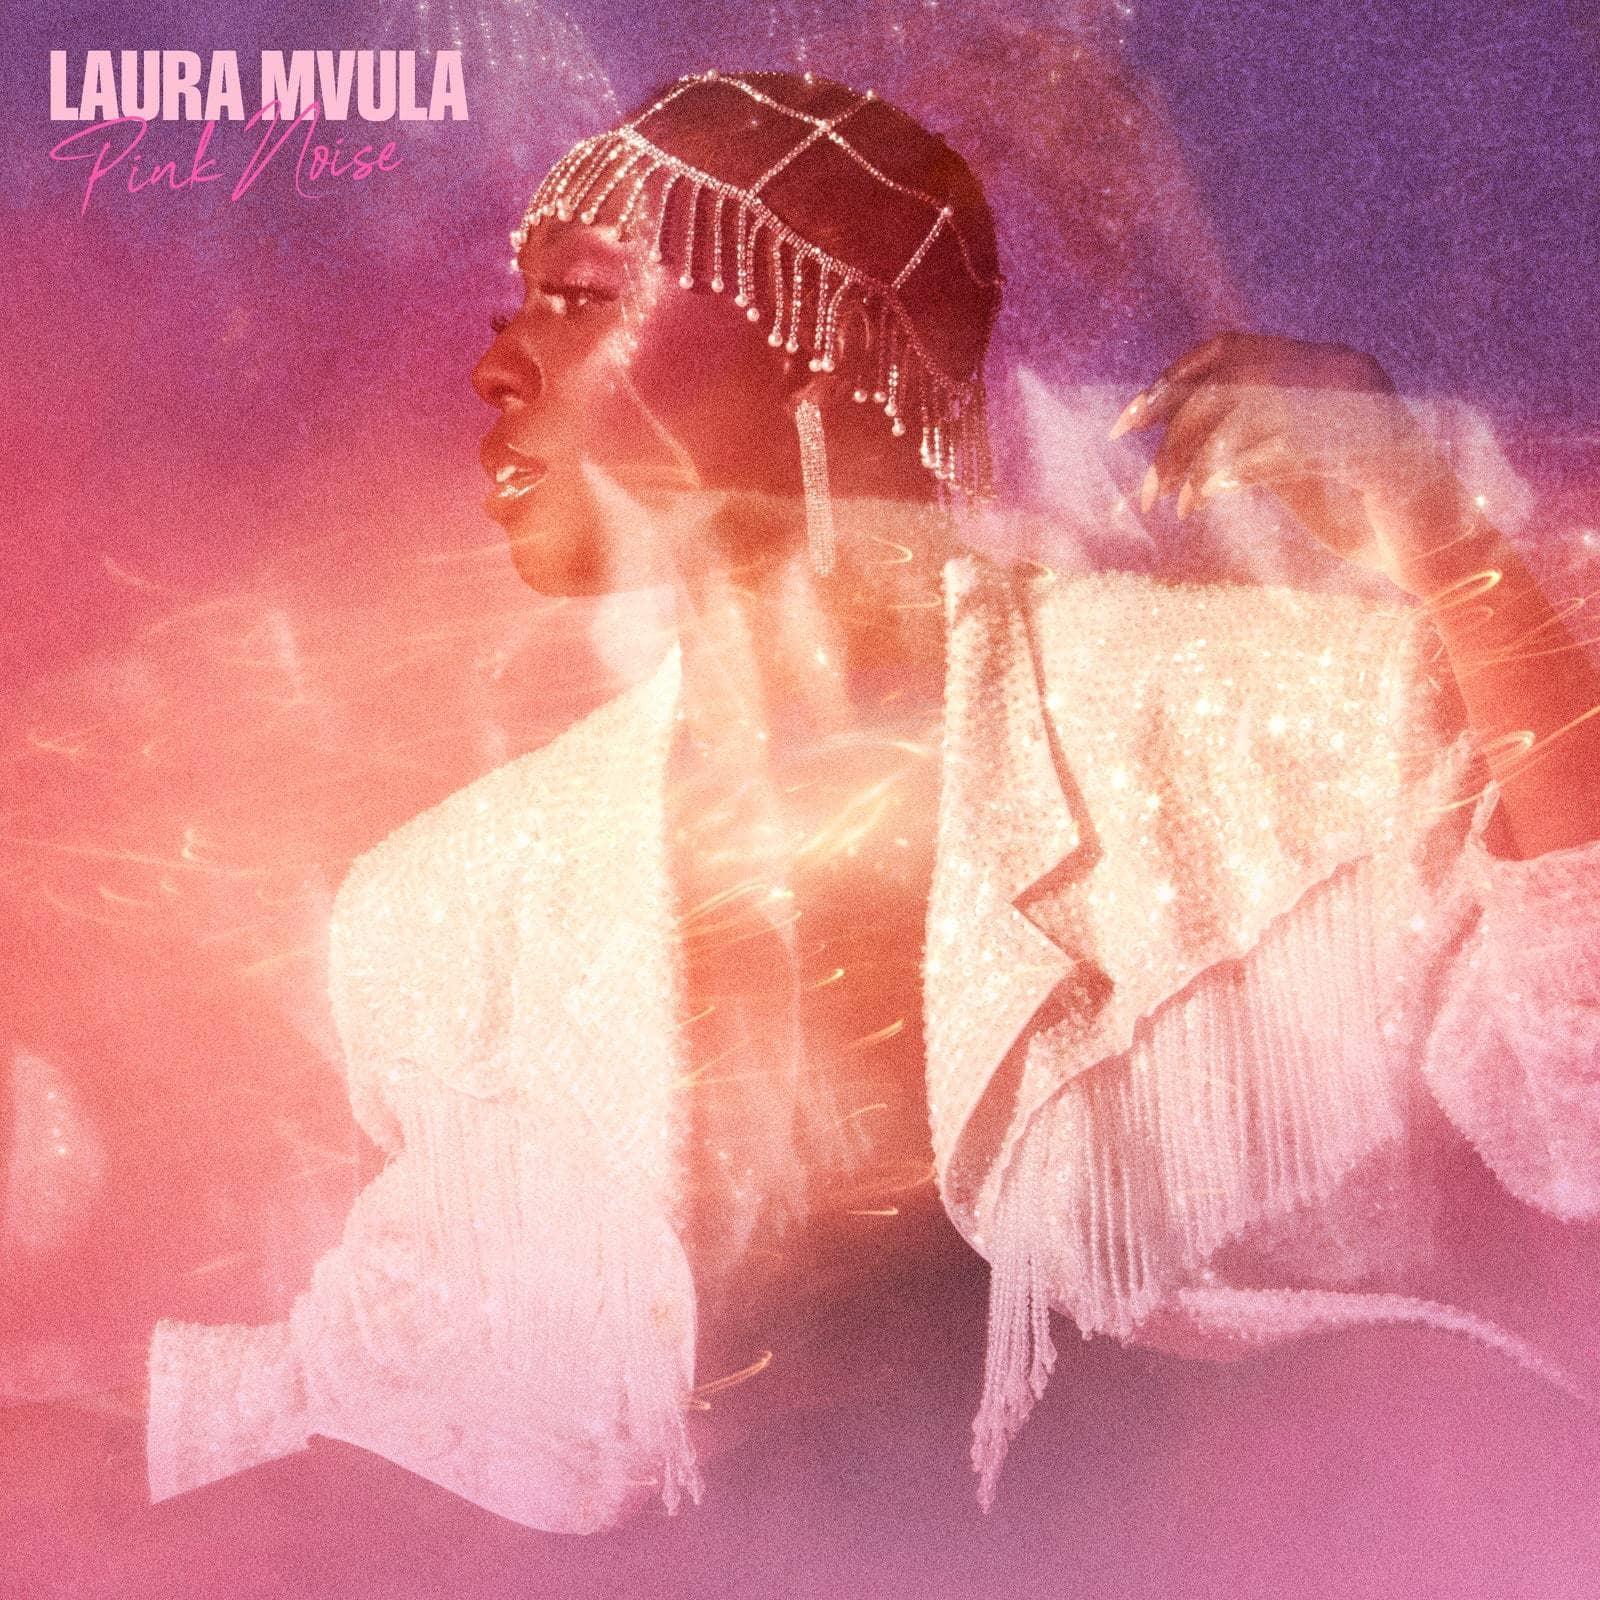 Laura Mvula 'Pink Noise'